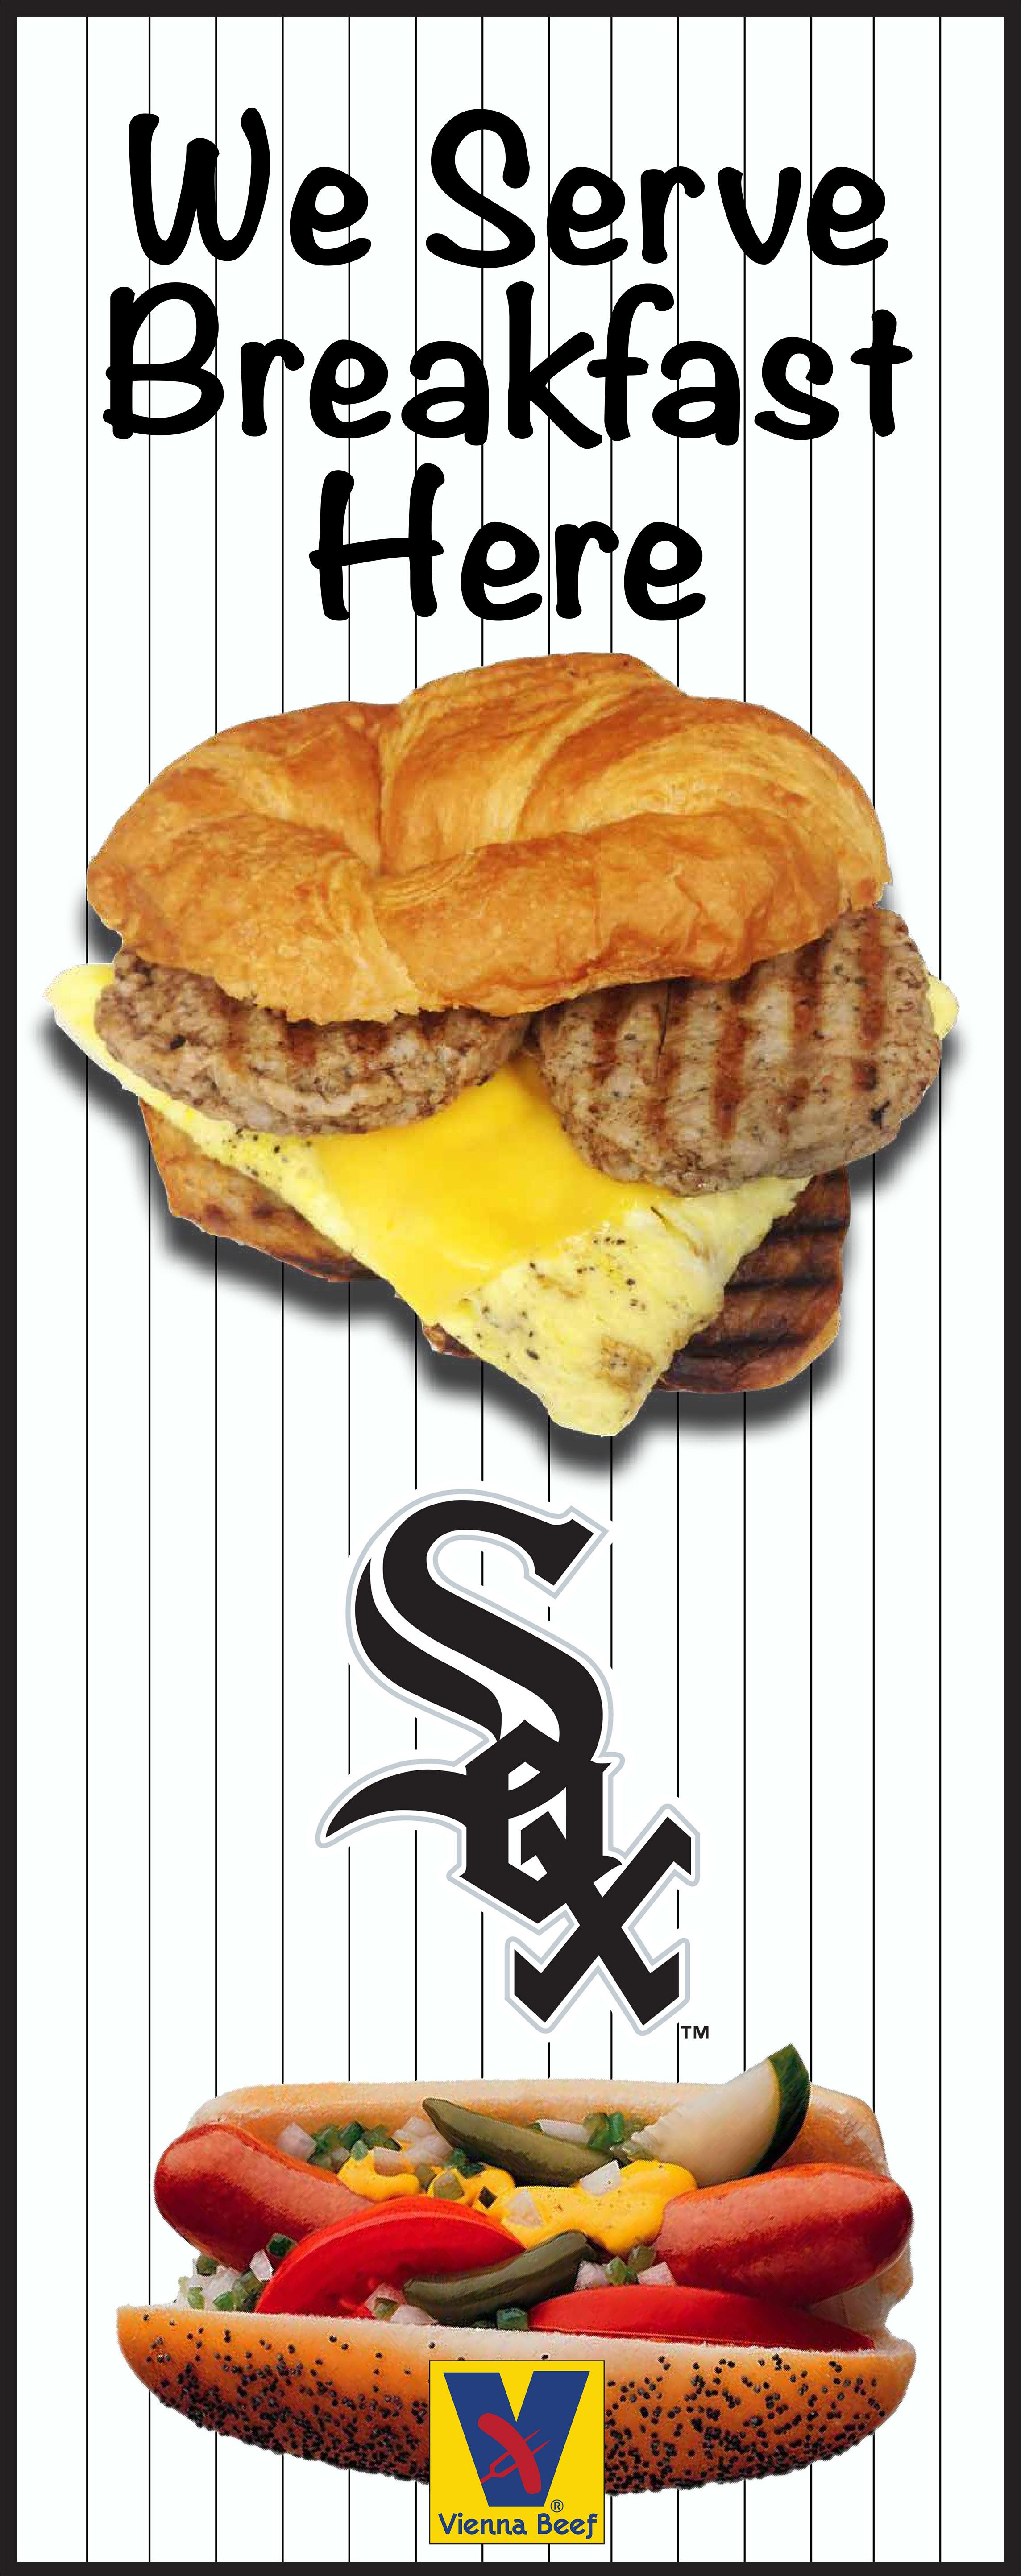 Sox McCormick BreakFast Poster